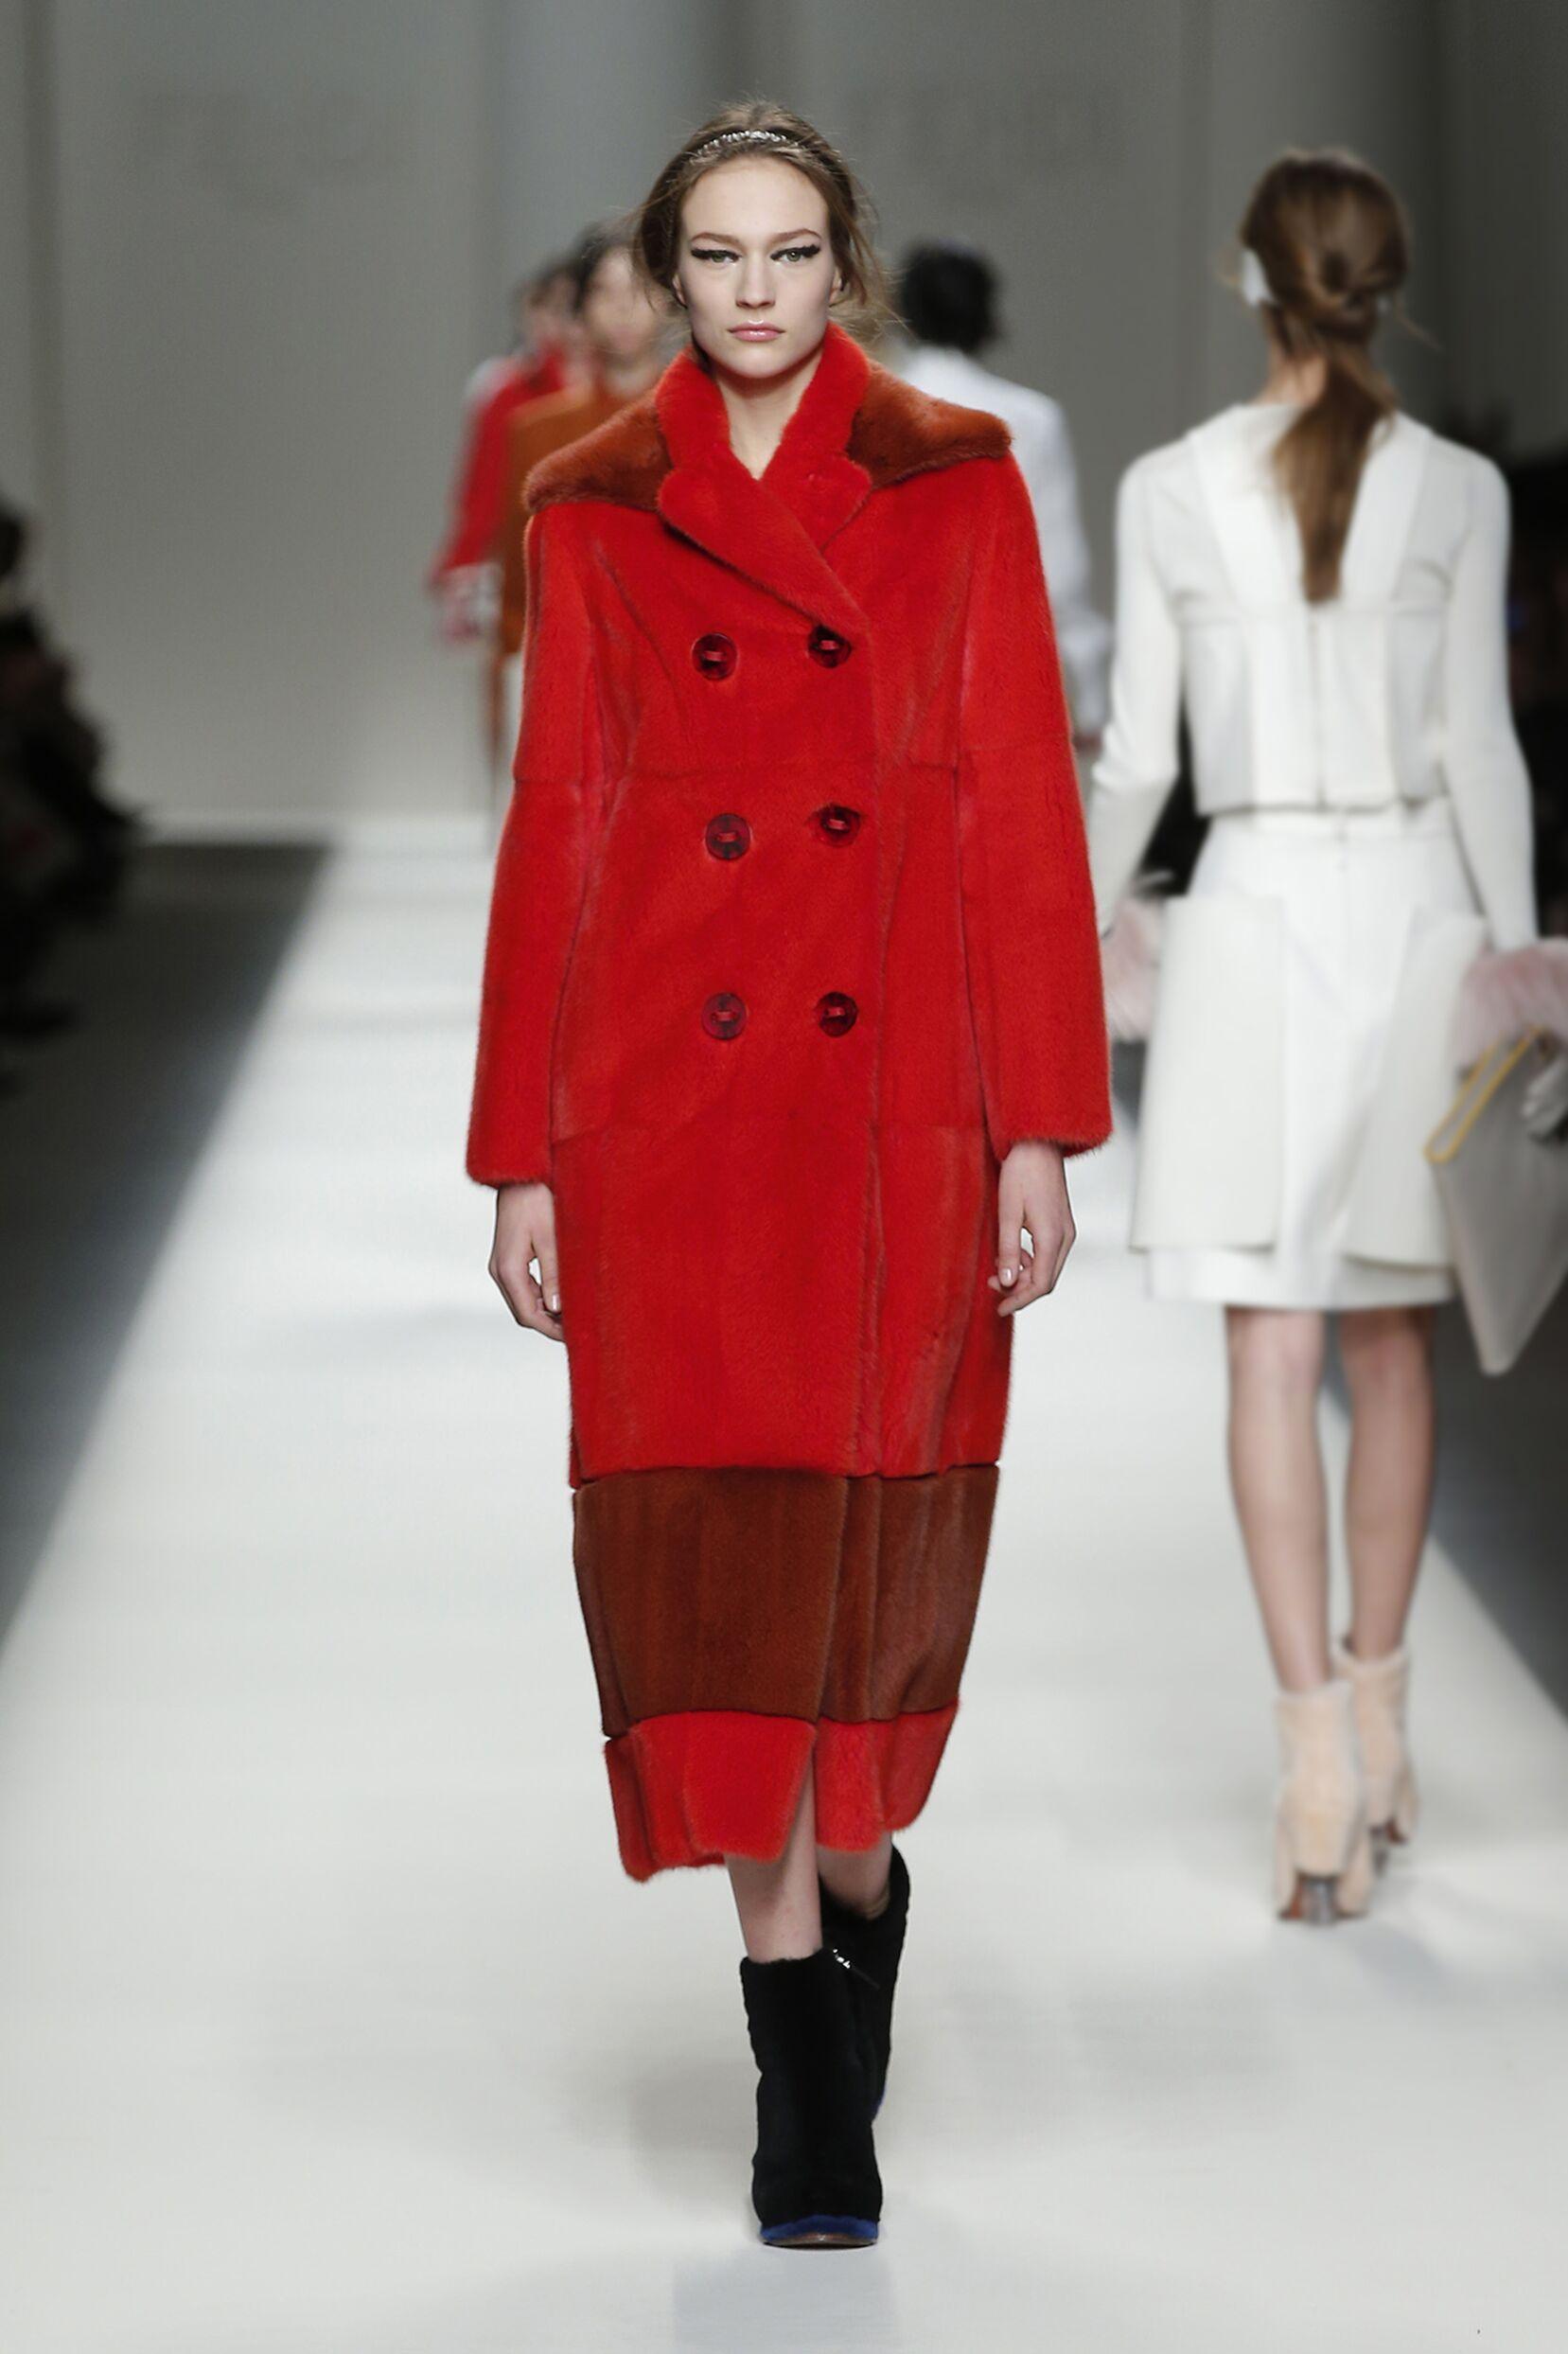 Fendi Fall Winter 2015 16 Womenswear Collection Milan Fashion Week Fashion Show